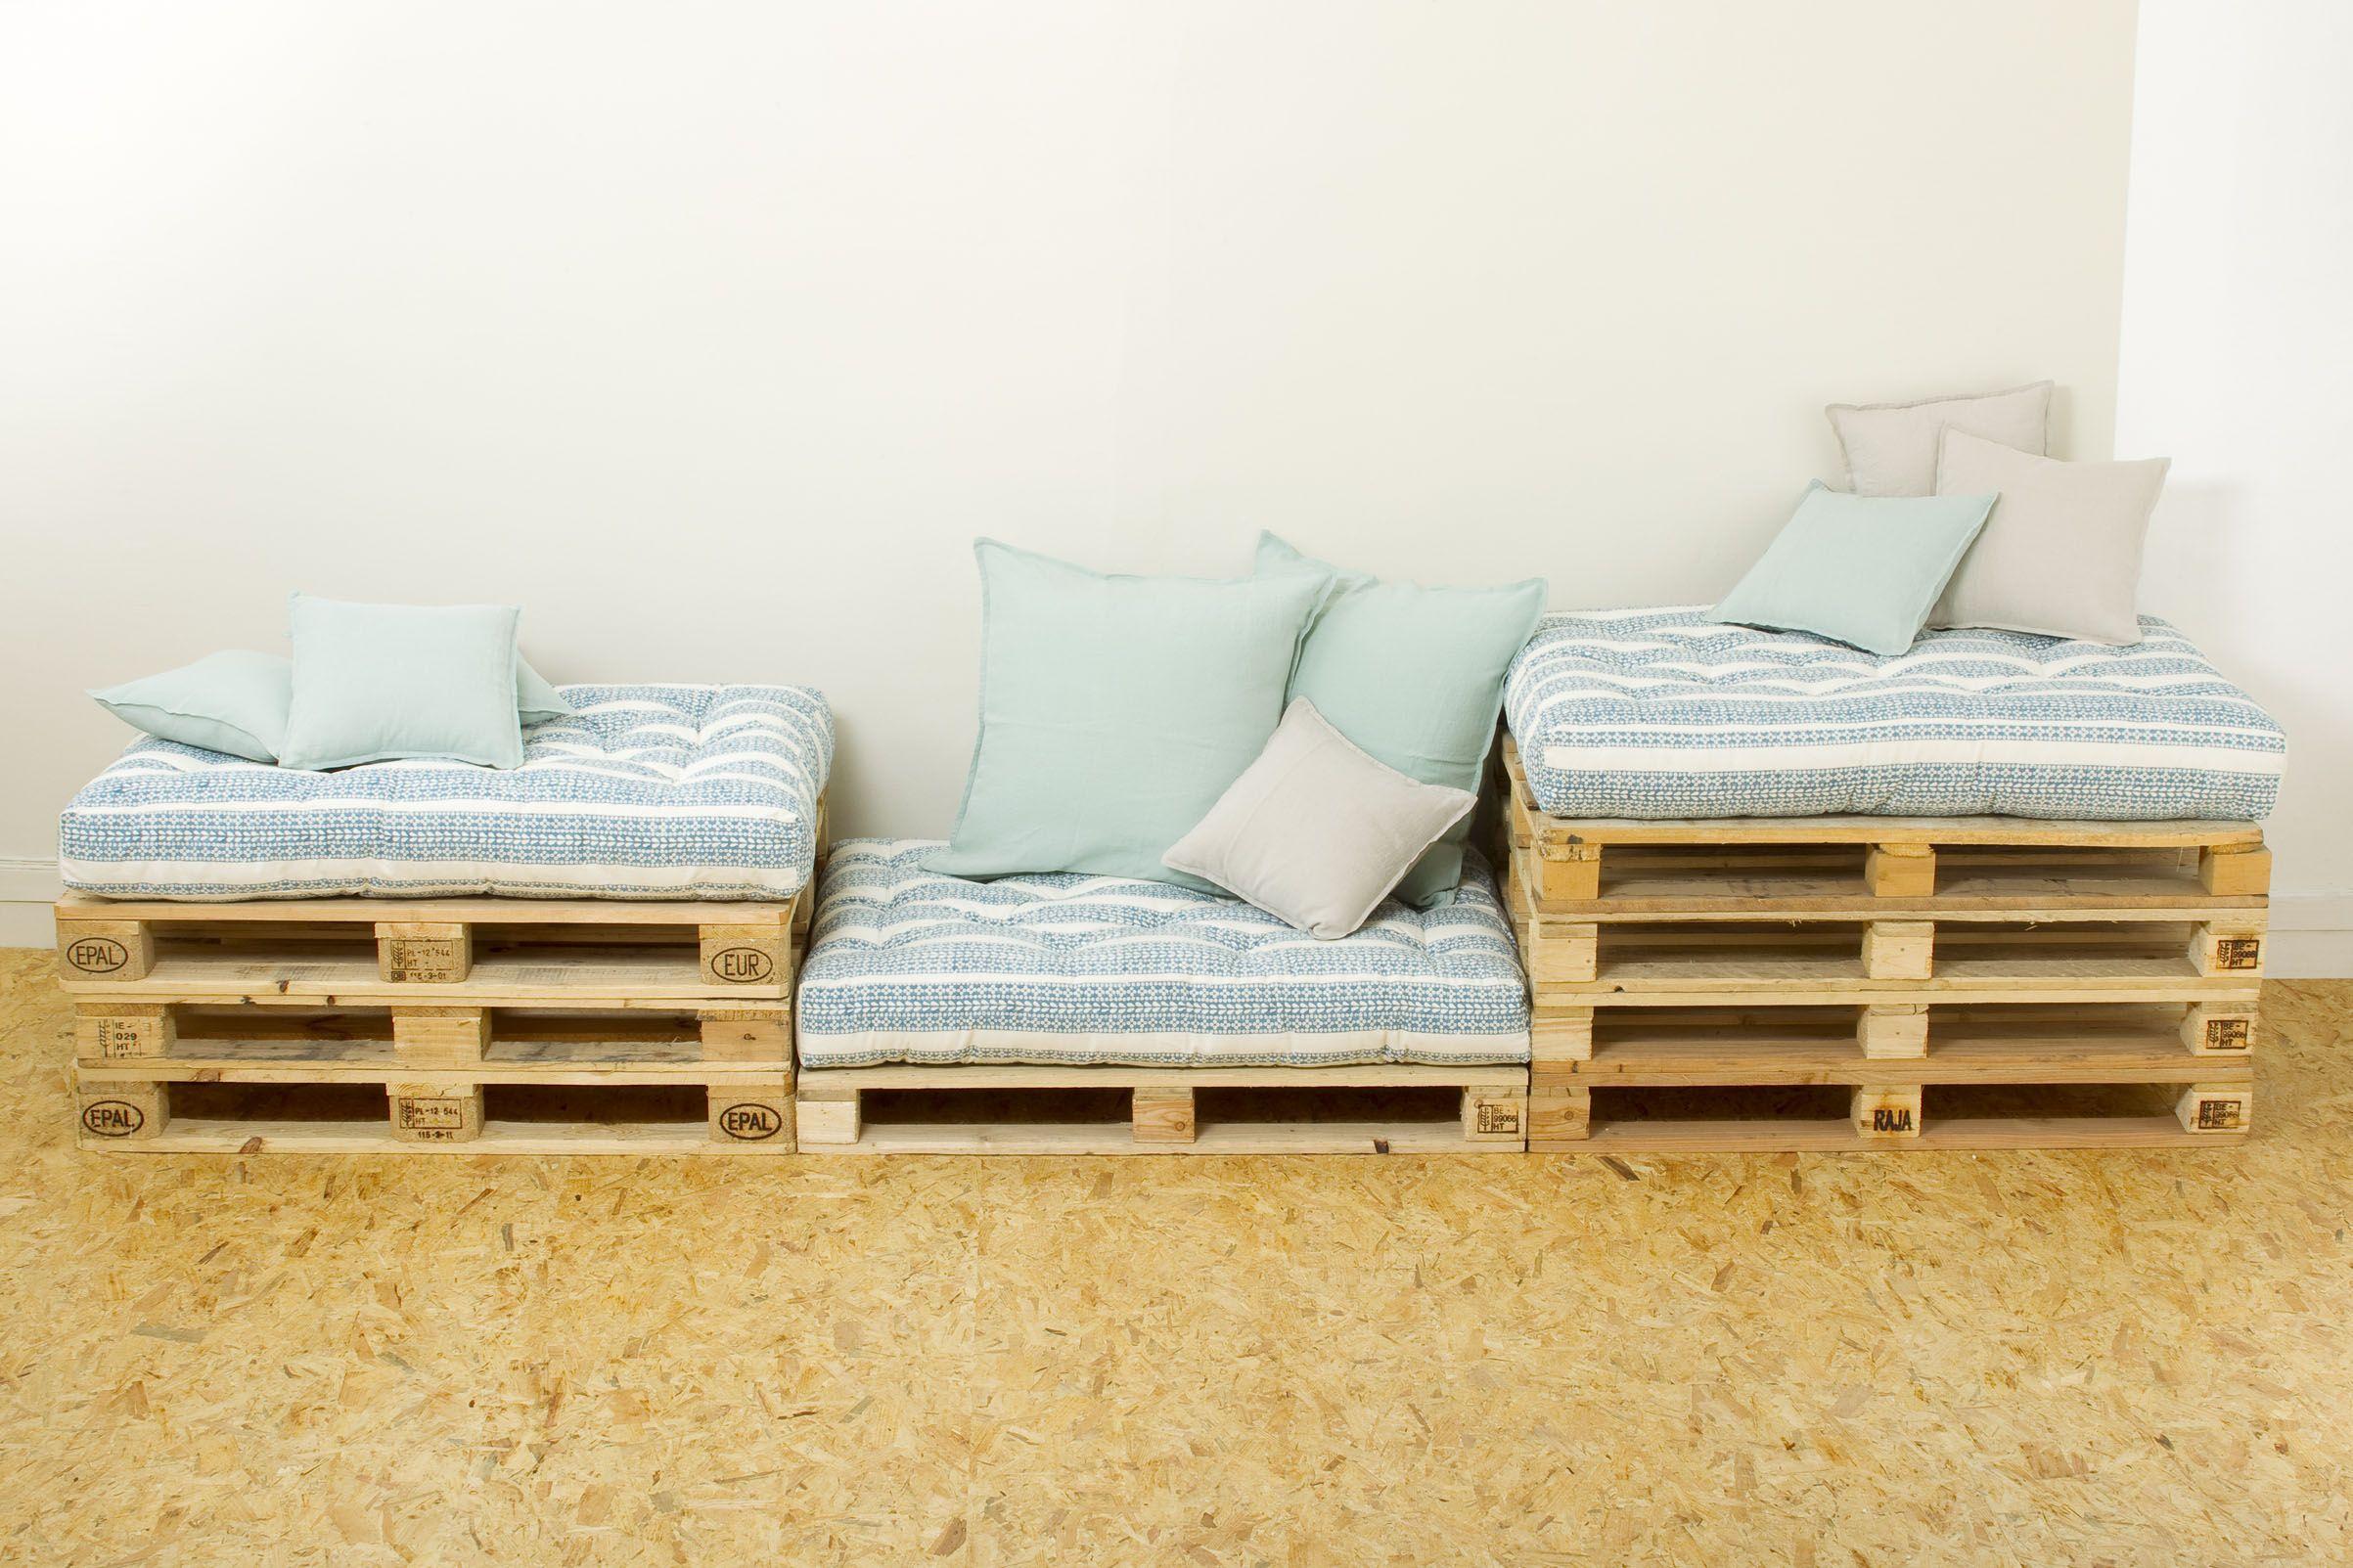 canap modulable coussins crate le monde sauvage canap banquette charpo pinterest. Black Bedroom Furniture Sets. Home Design Ideas